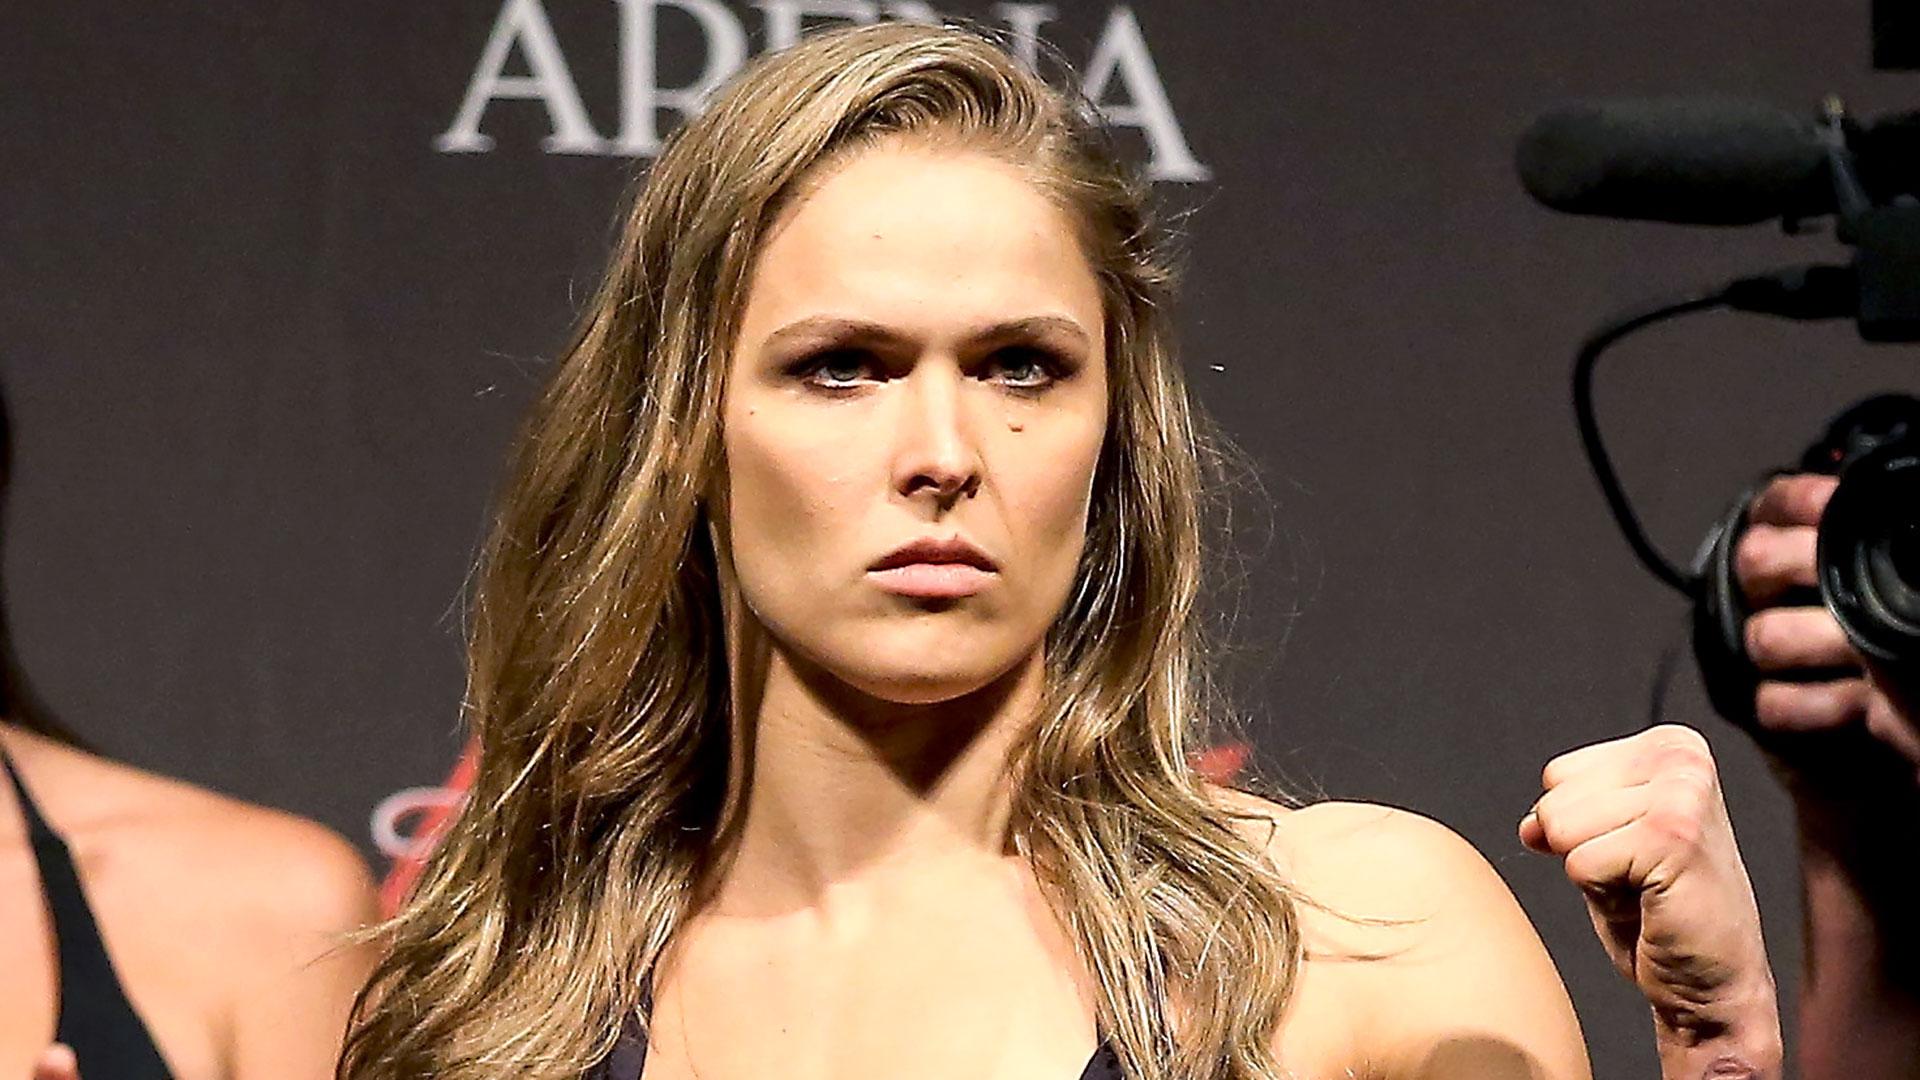 Ronda Rousey NO DAPL